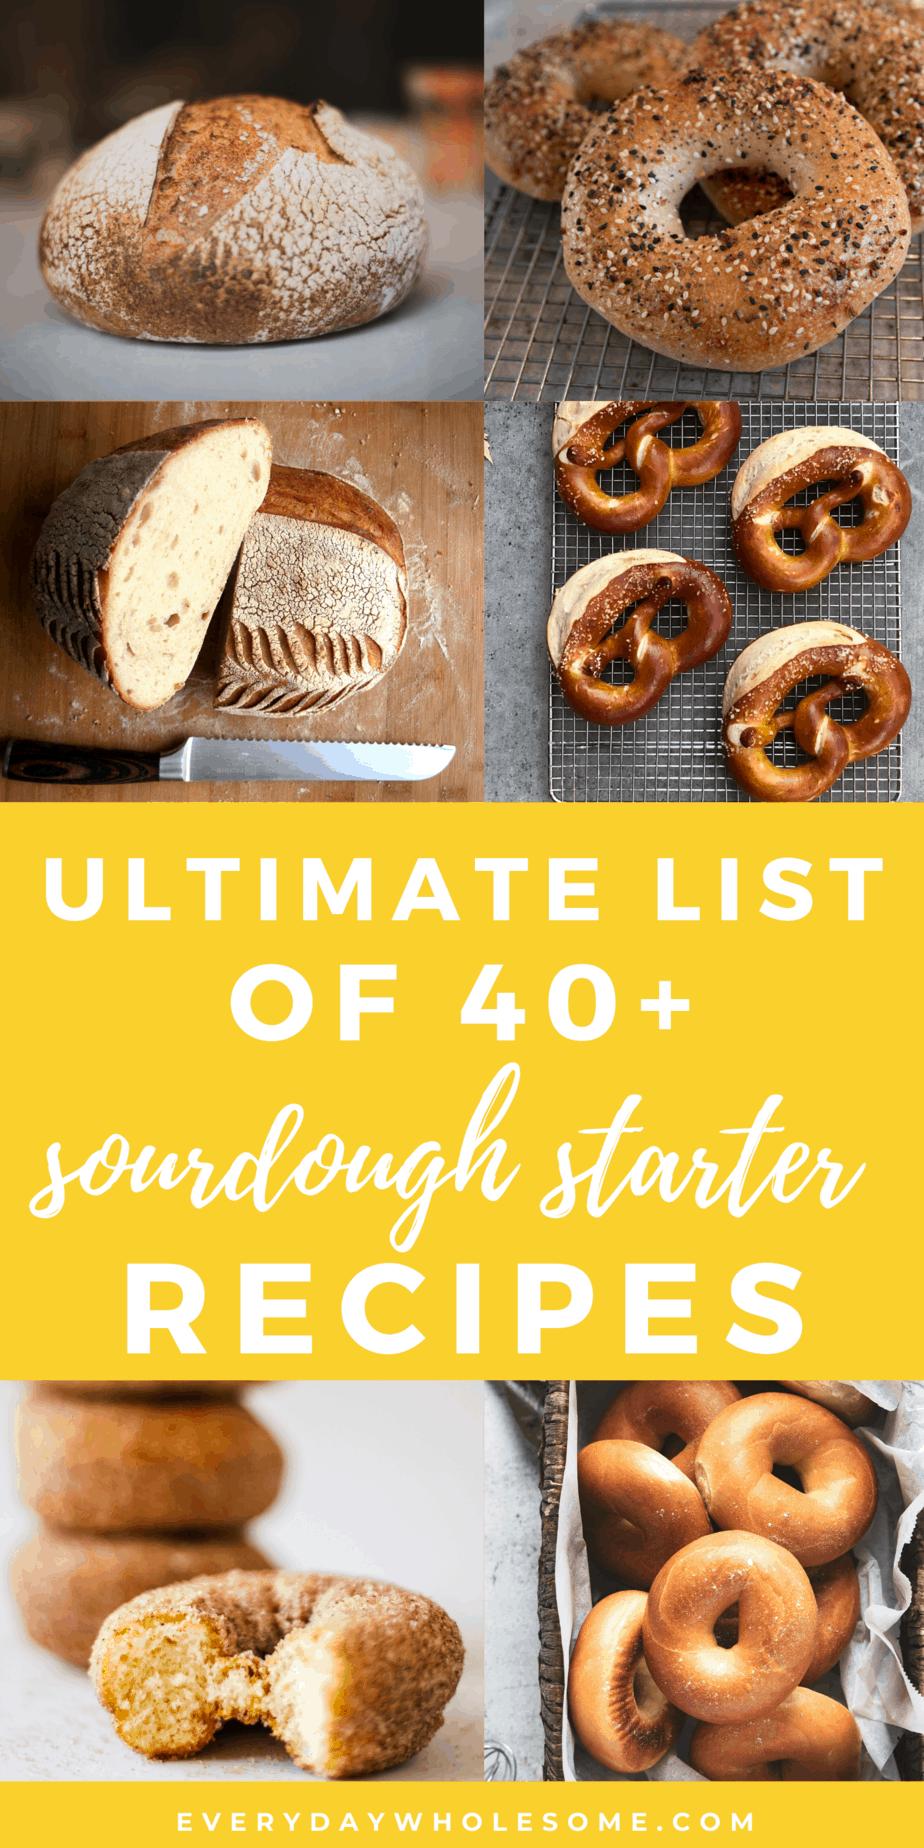 ULTIMATE LIST OF 40 SOURDOUGH BREAD RECIPES